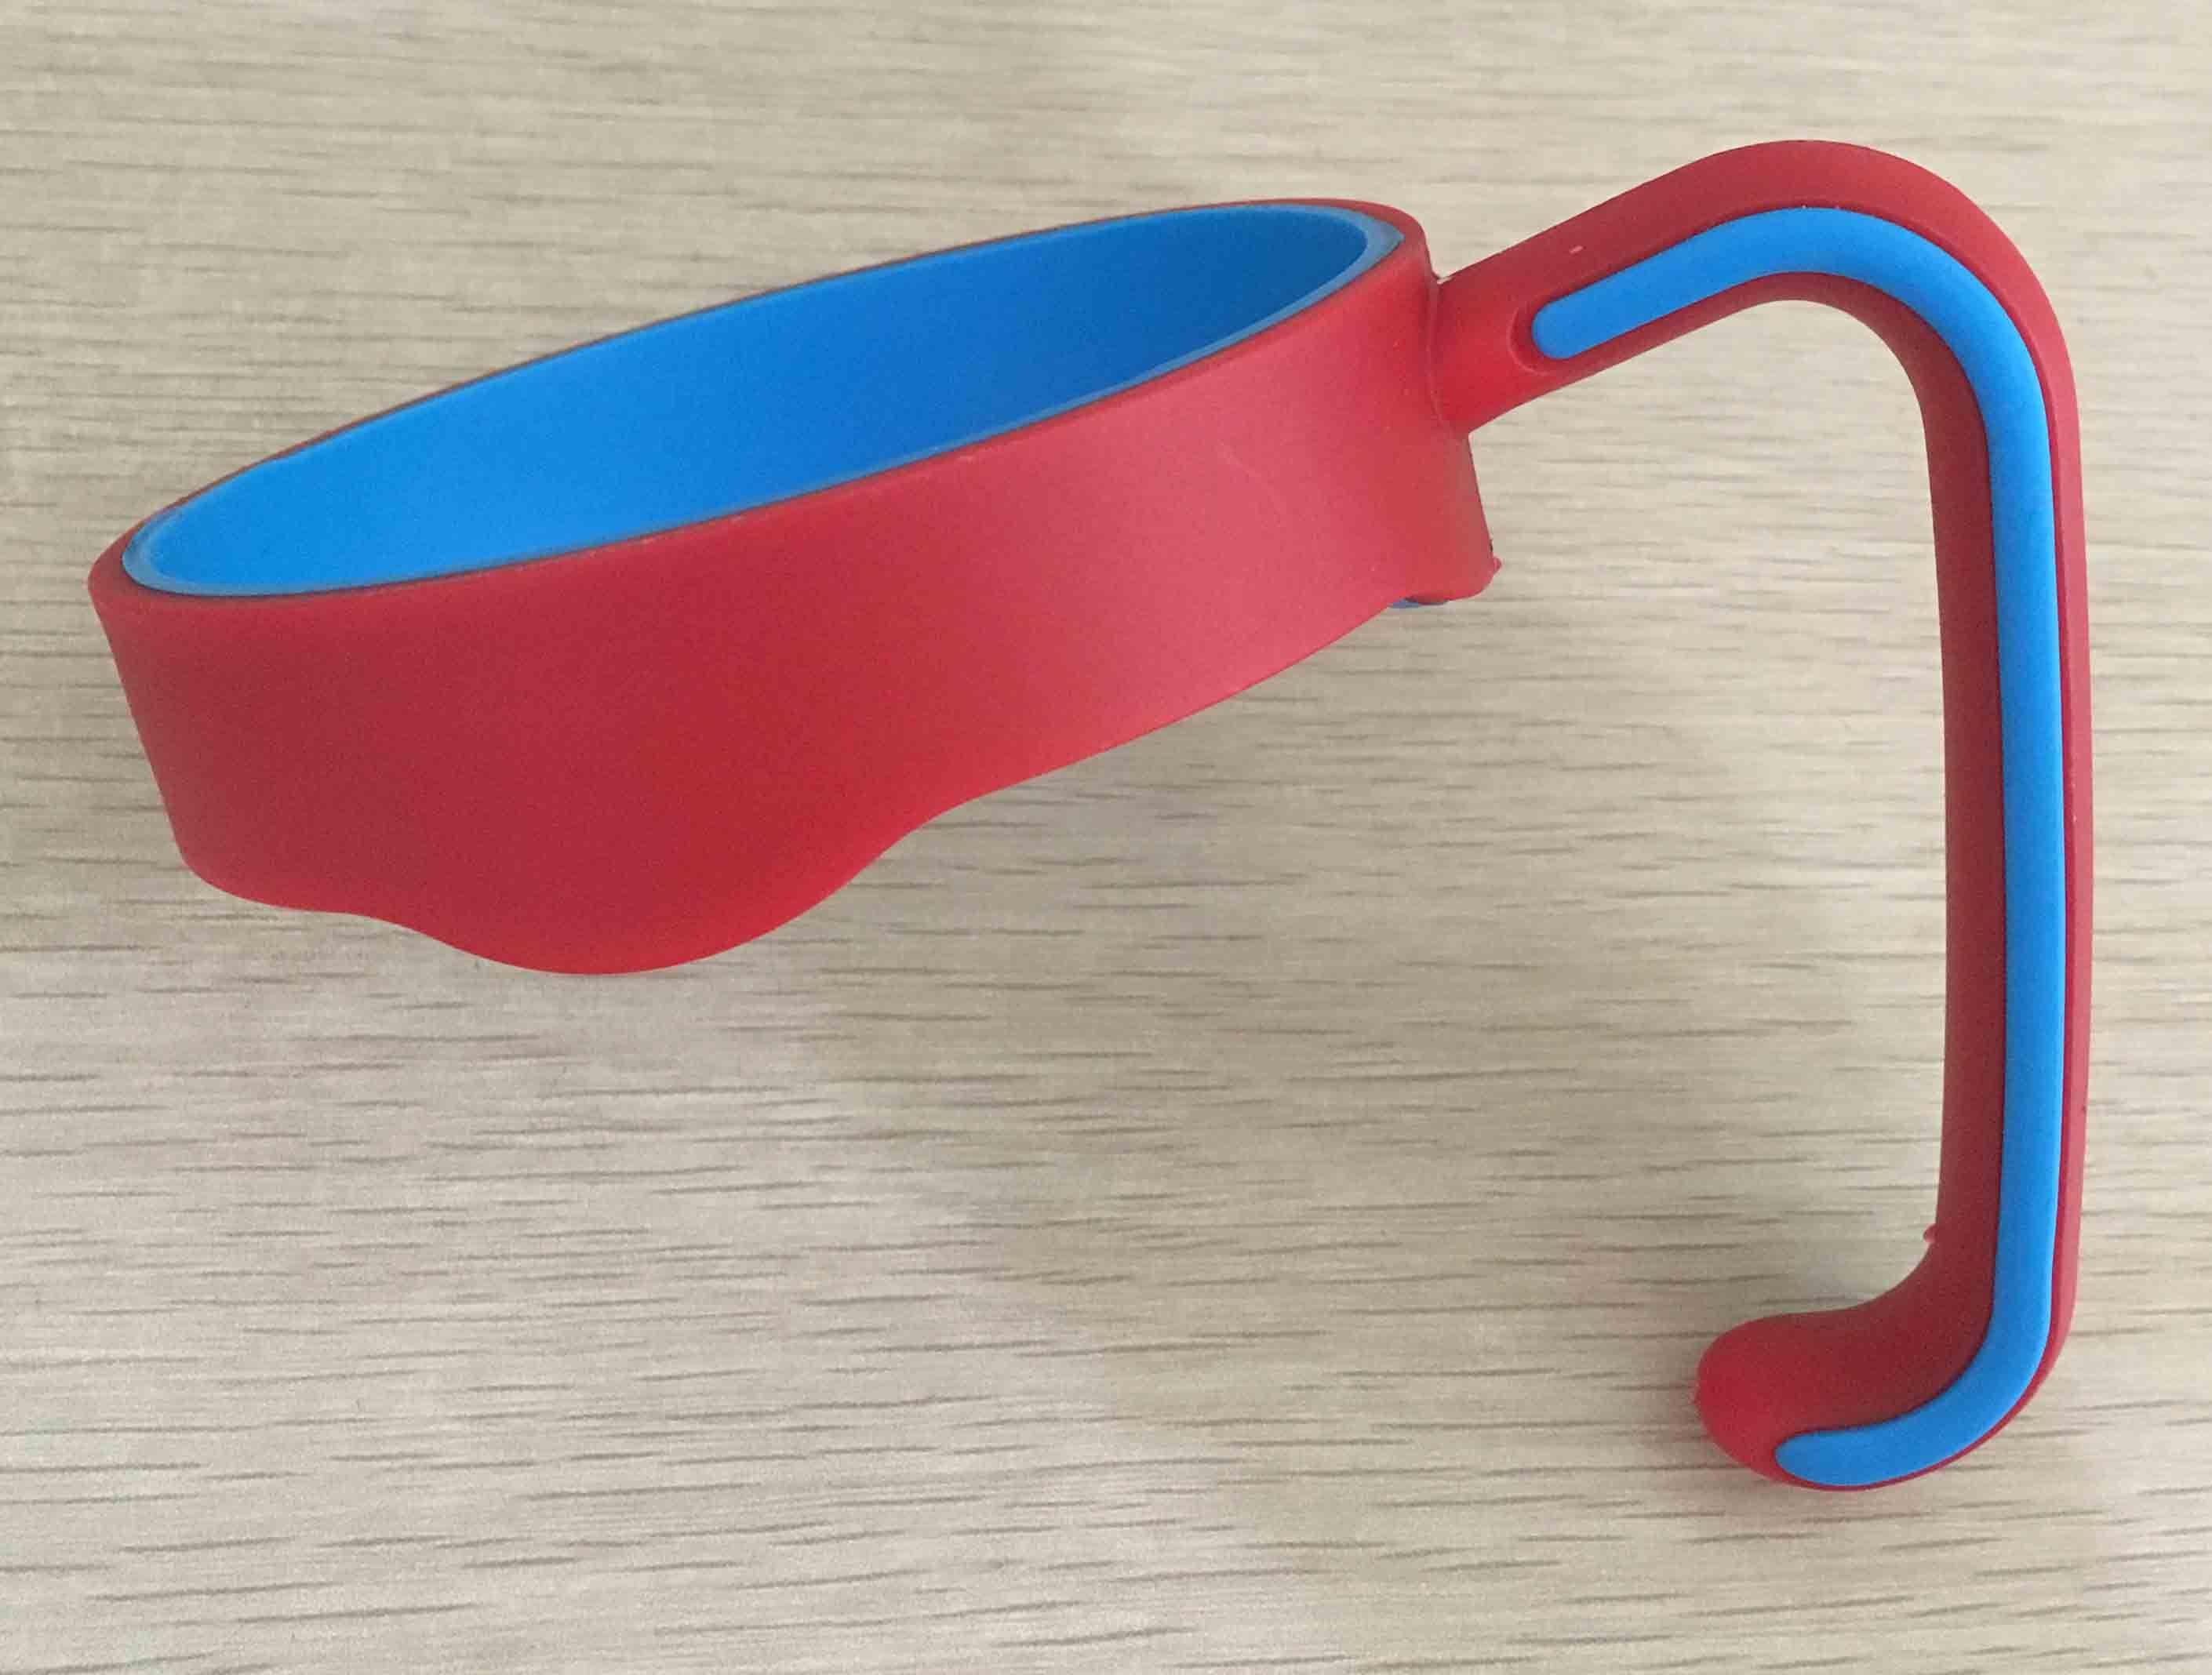 20oz Handles 스테인레스 스틸 컵용 20oz 홀더 20cm 컵용 singler layer handle 5 색 있음